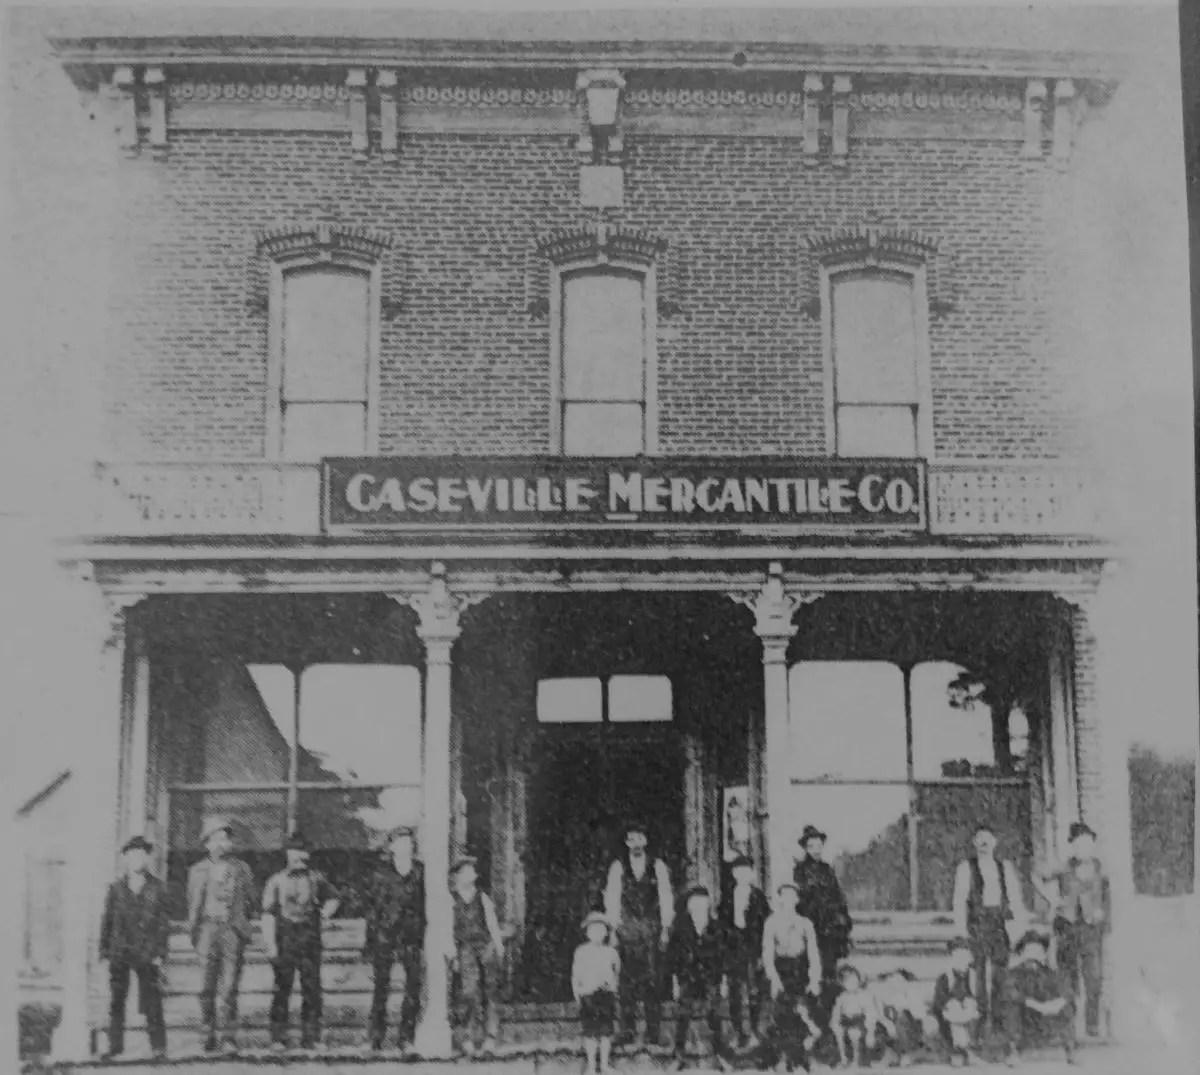 Caseville Mercantile